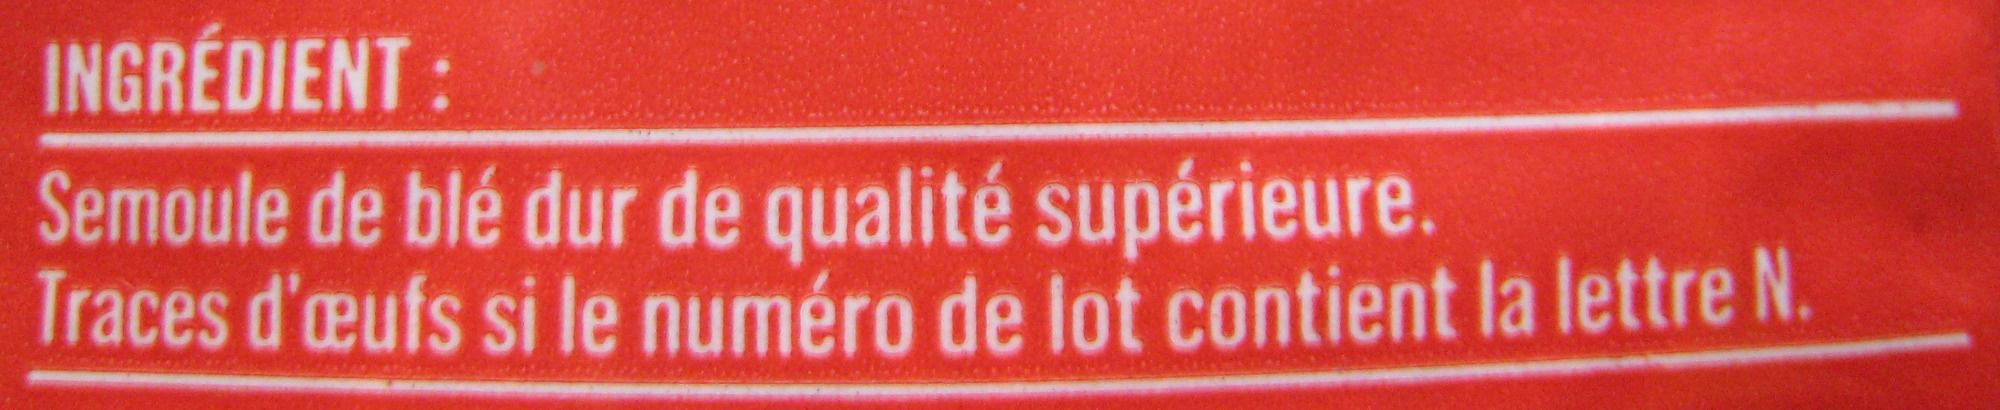 Cheveux d'Ange (Al dente 3 min.) - Ingredients - fr